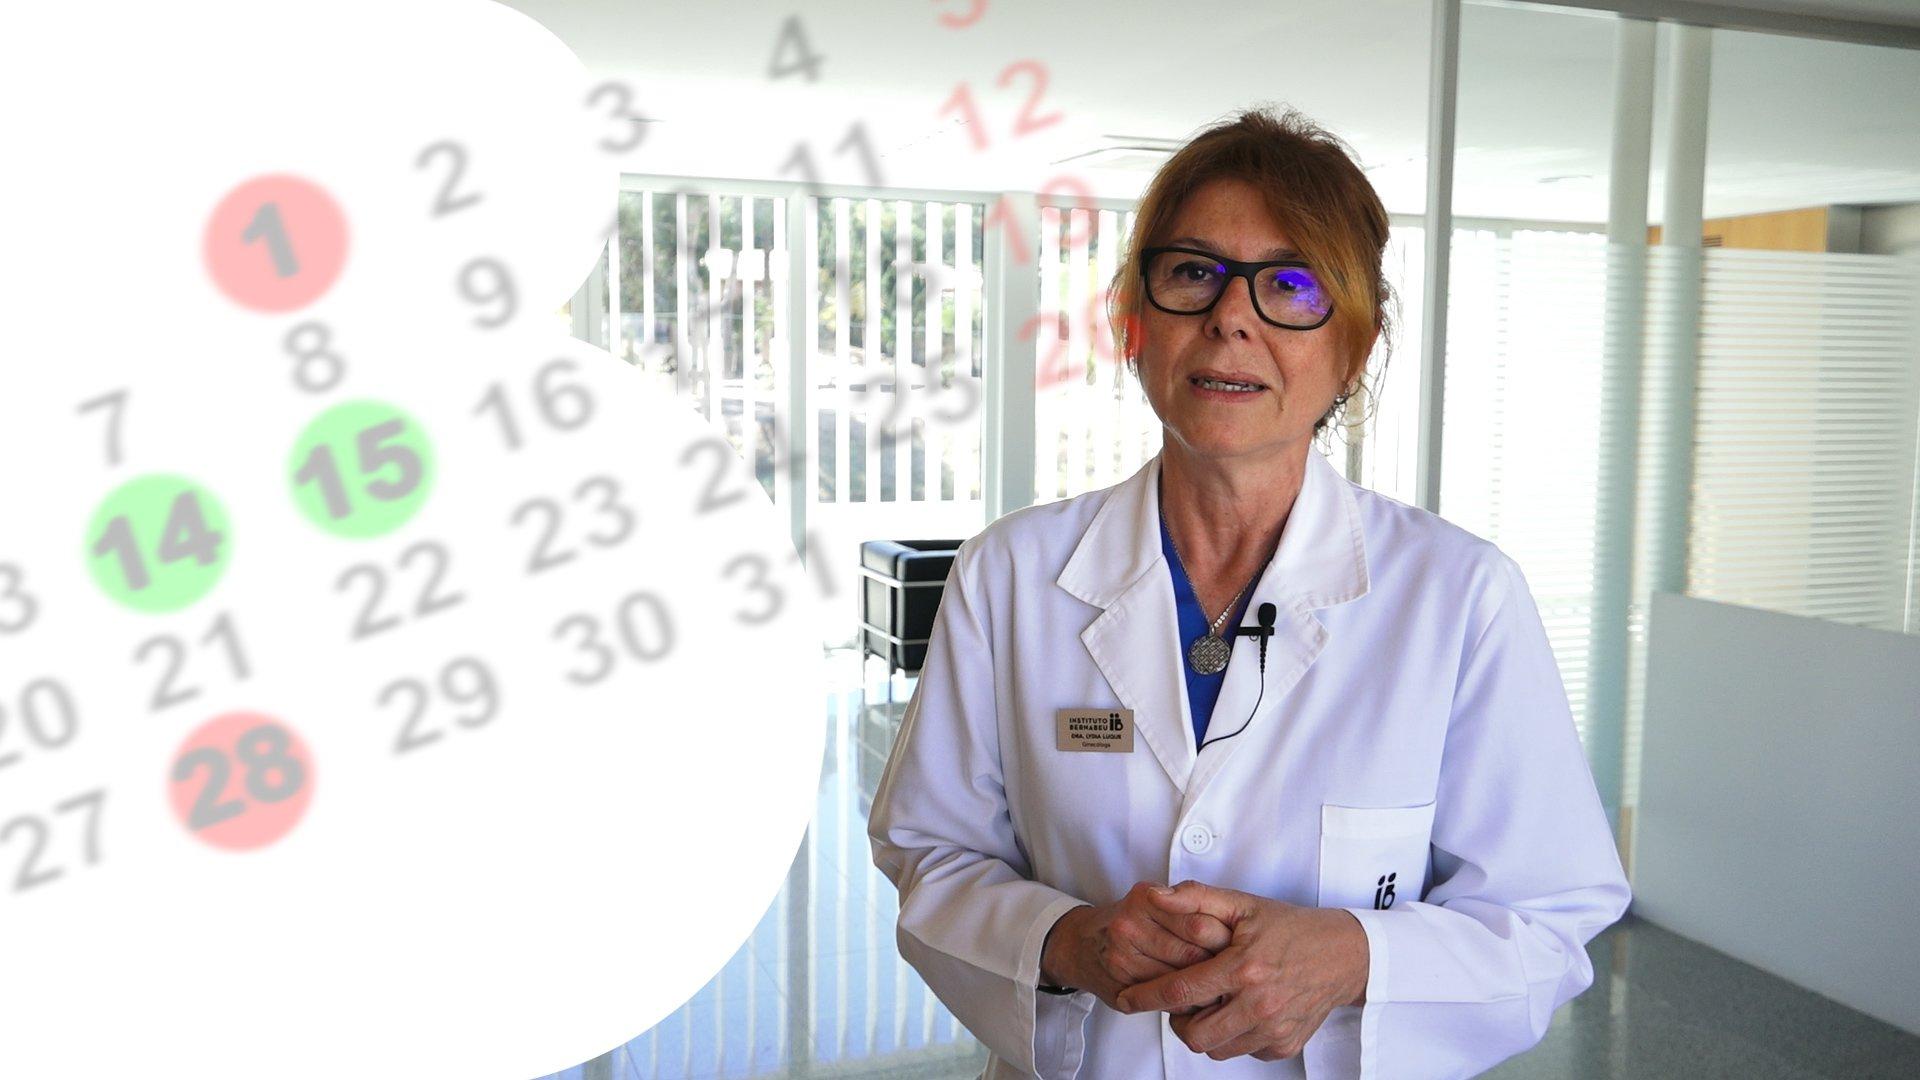 Fiable Calendario Chino De Embarazo 2019.Calculadora Ovulacion Conozca Su Calendario De Ovulacion